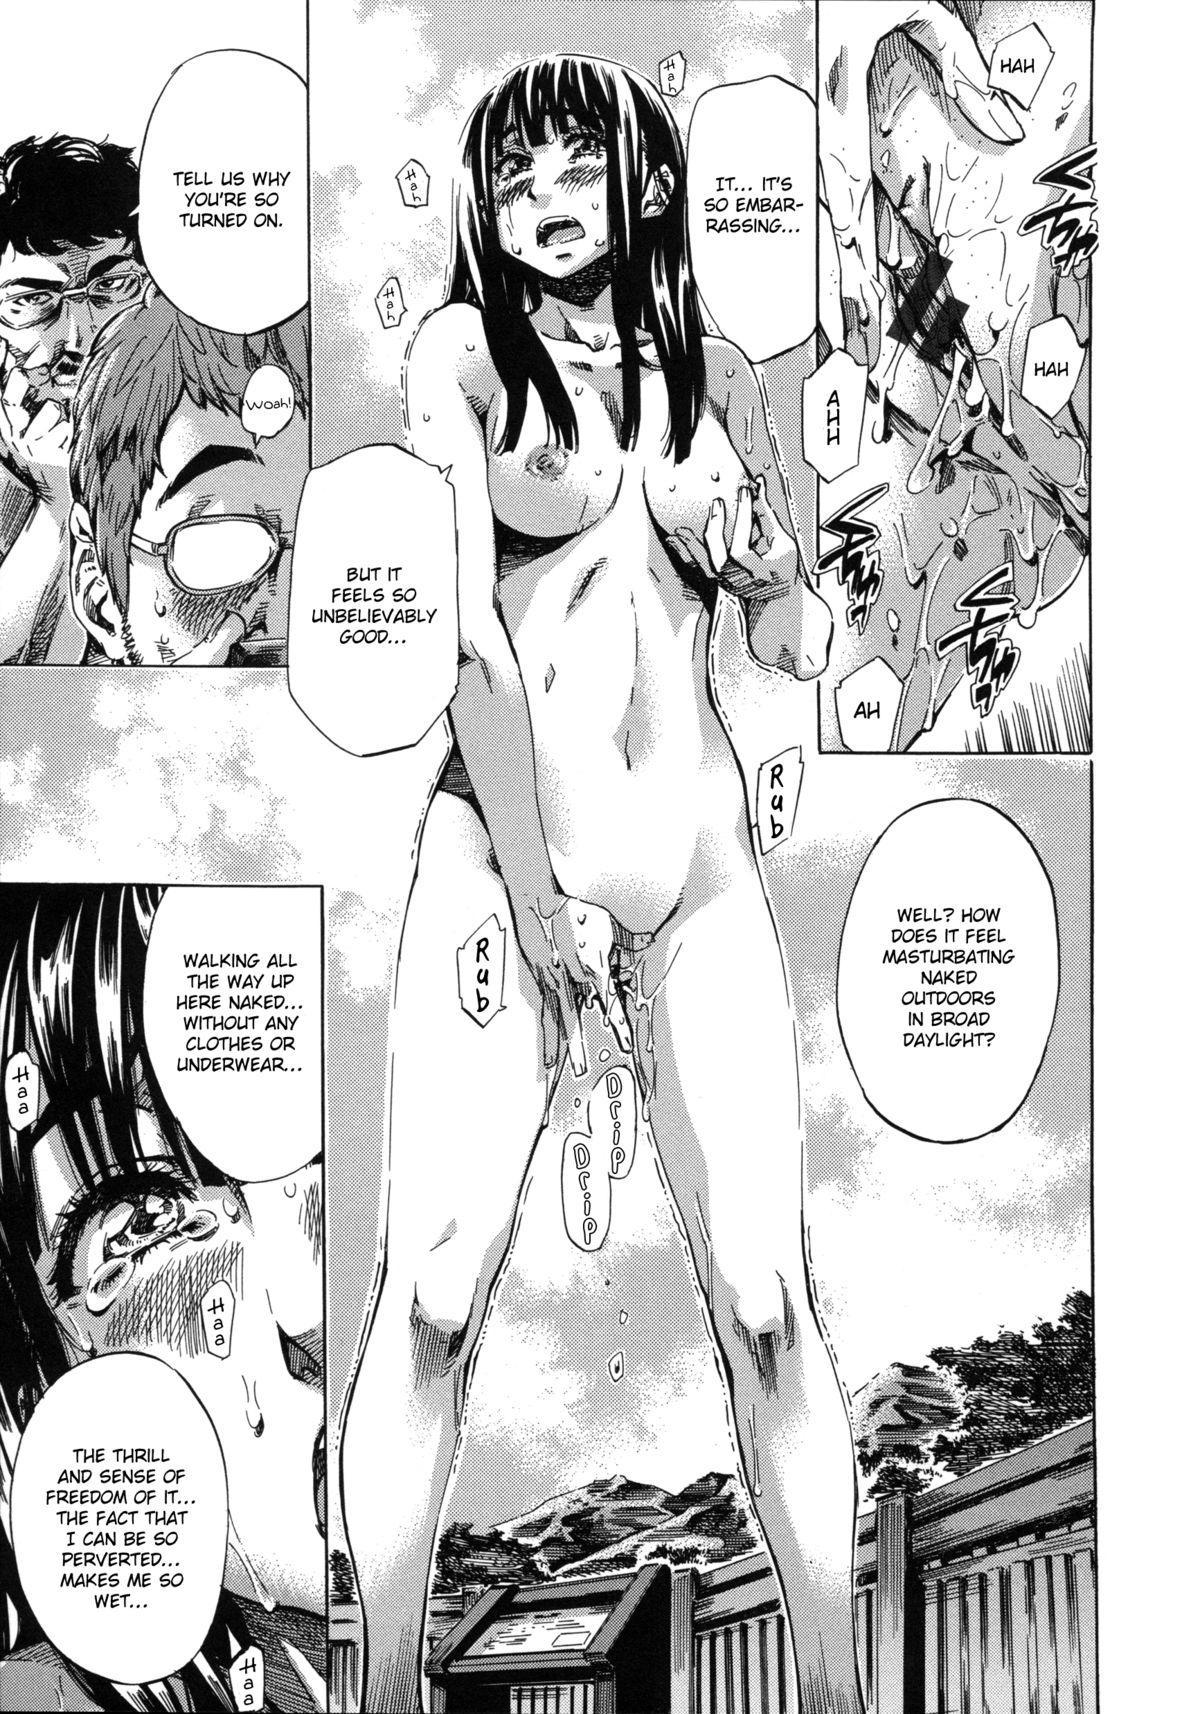 Kashiwazaki Miki wa Ironna Basho de Zenra Sanpo Shitemita | Miki Kashiwazaki Goes Naked in All Sorts of Places 159